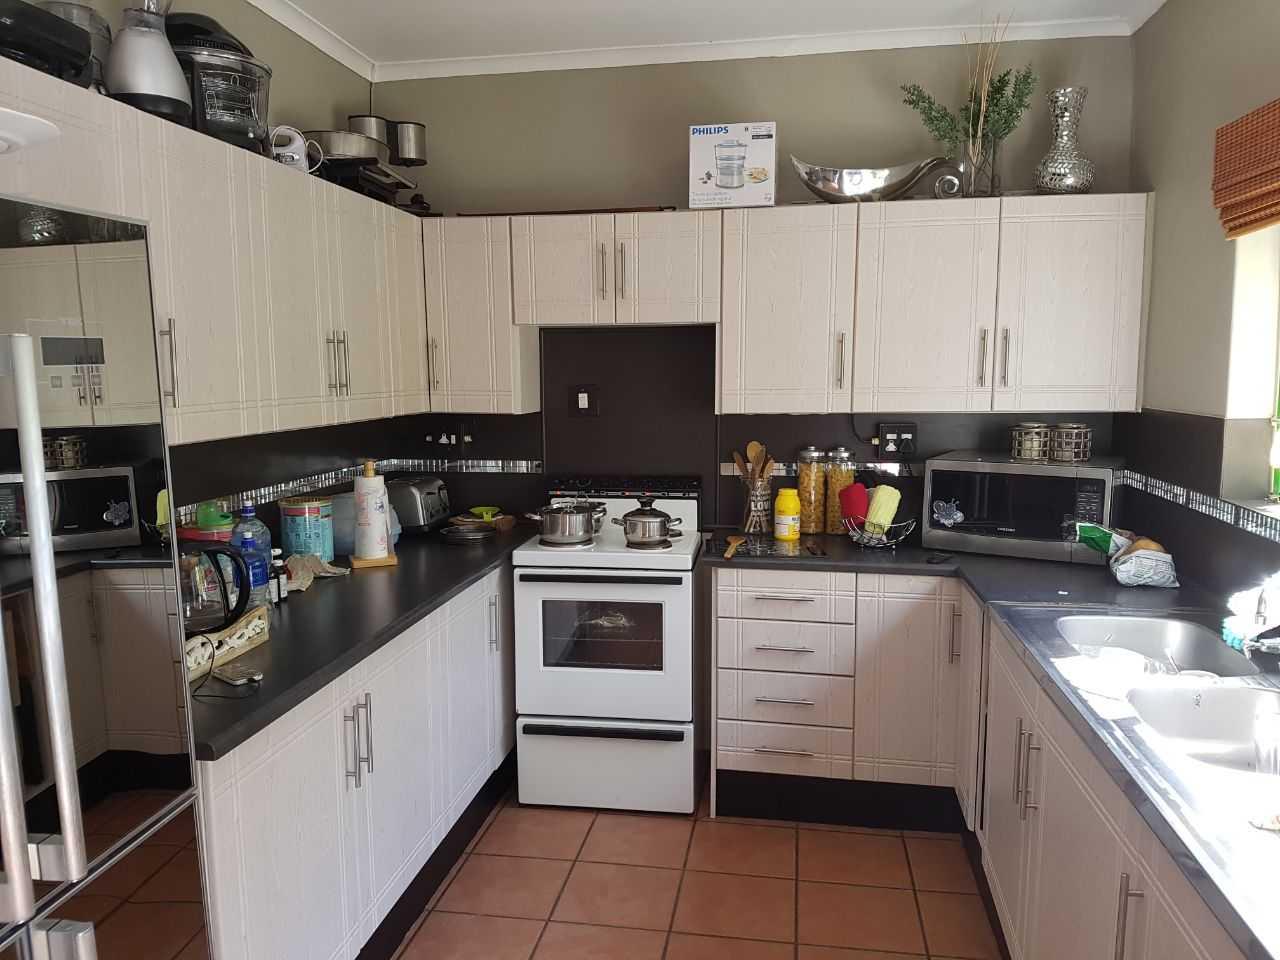 3 bedroom 2 bathroom property for sale in Antelope street Hoedspruit, Limpopo